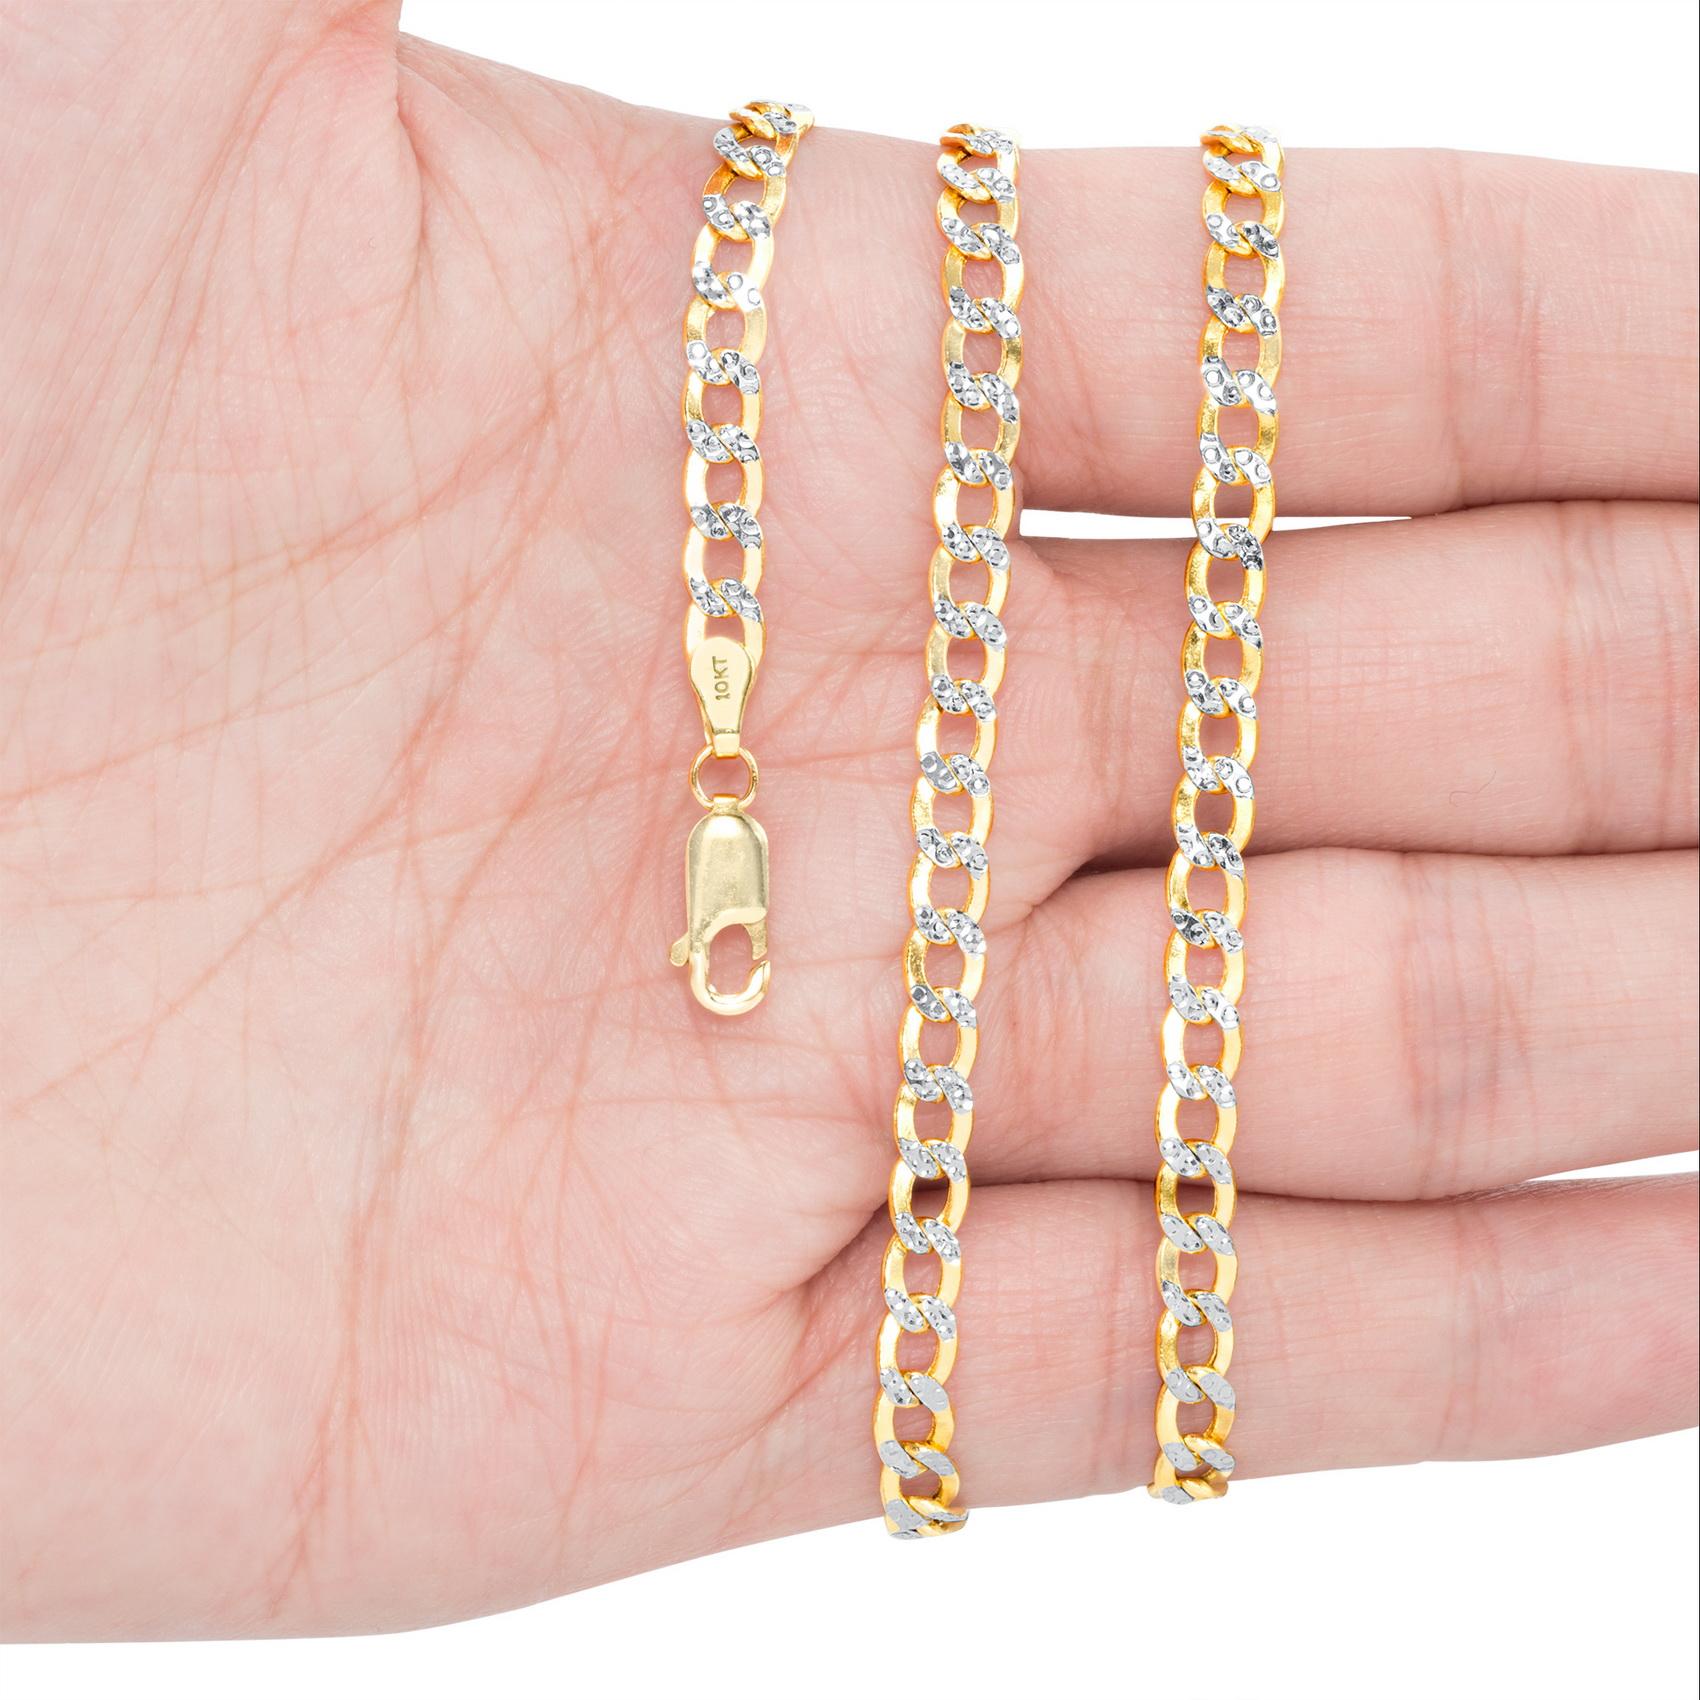 10K-Yellow-Gold-2mm-10-5mm-Diamond-Cut-Pave-Cuban-Chain-Necklace-Bracelet-7-034-30-034 thumbnail 19